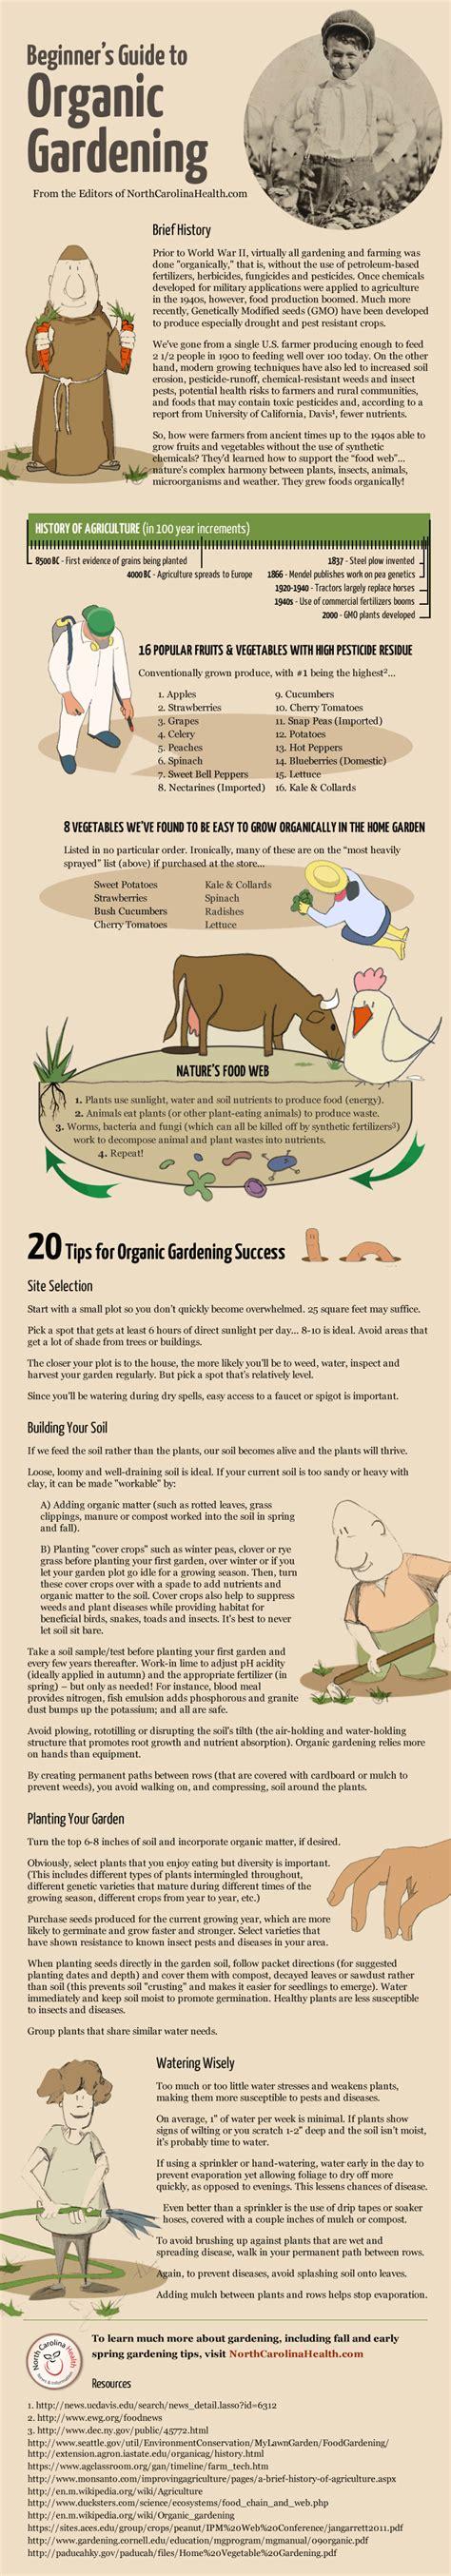 organic gardening affiliate programs infographic of tips for the beginning organic gardener